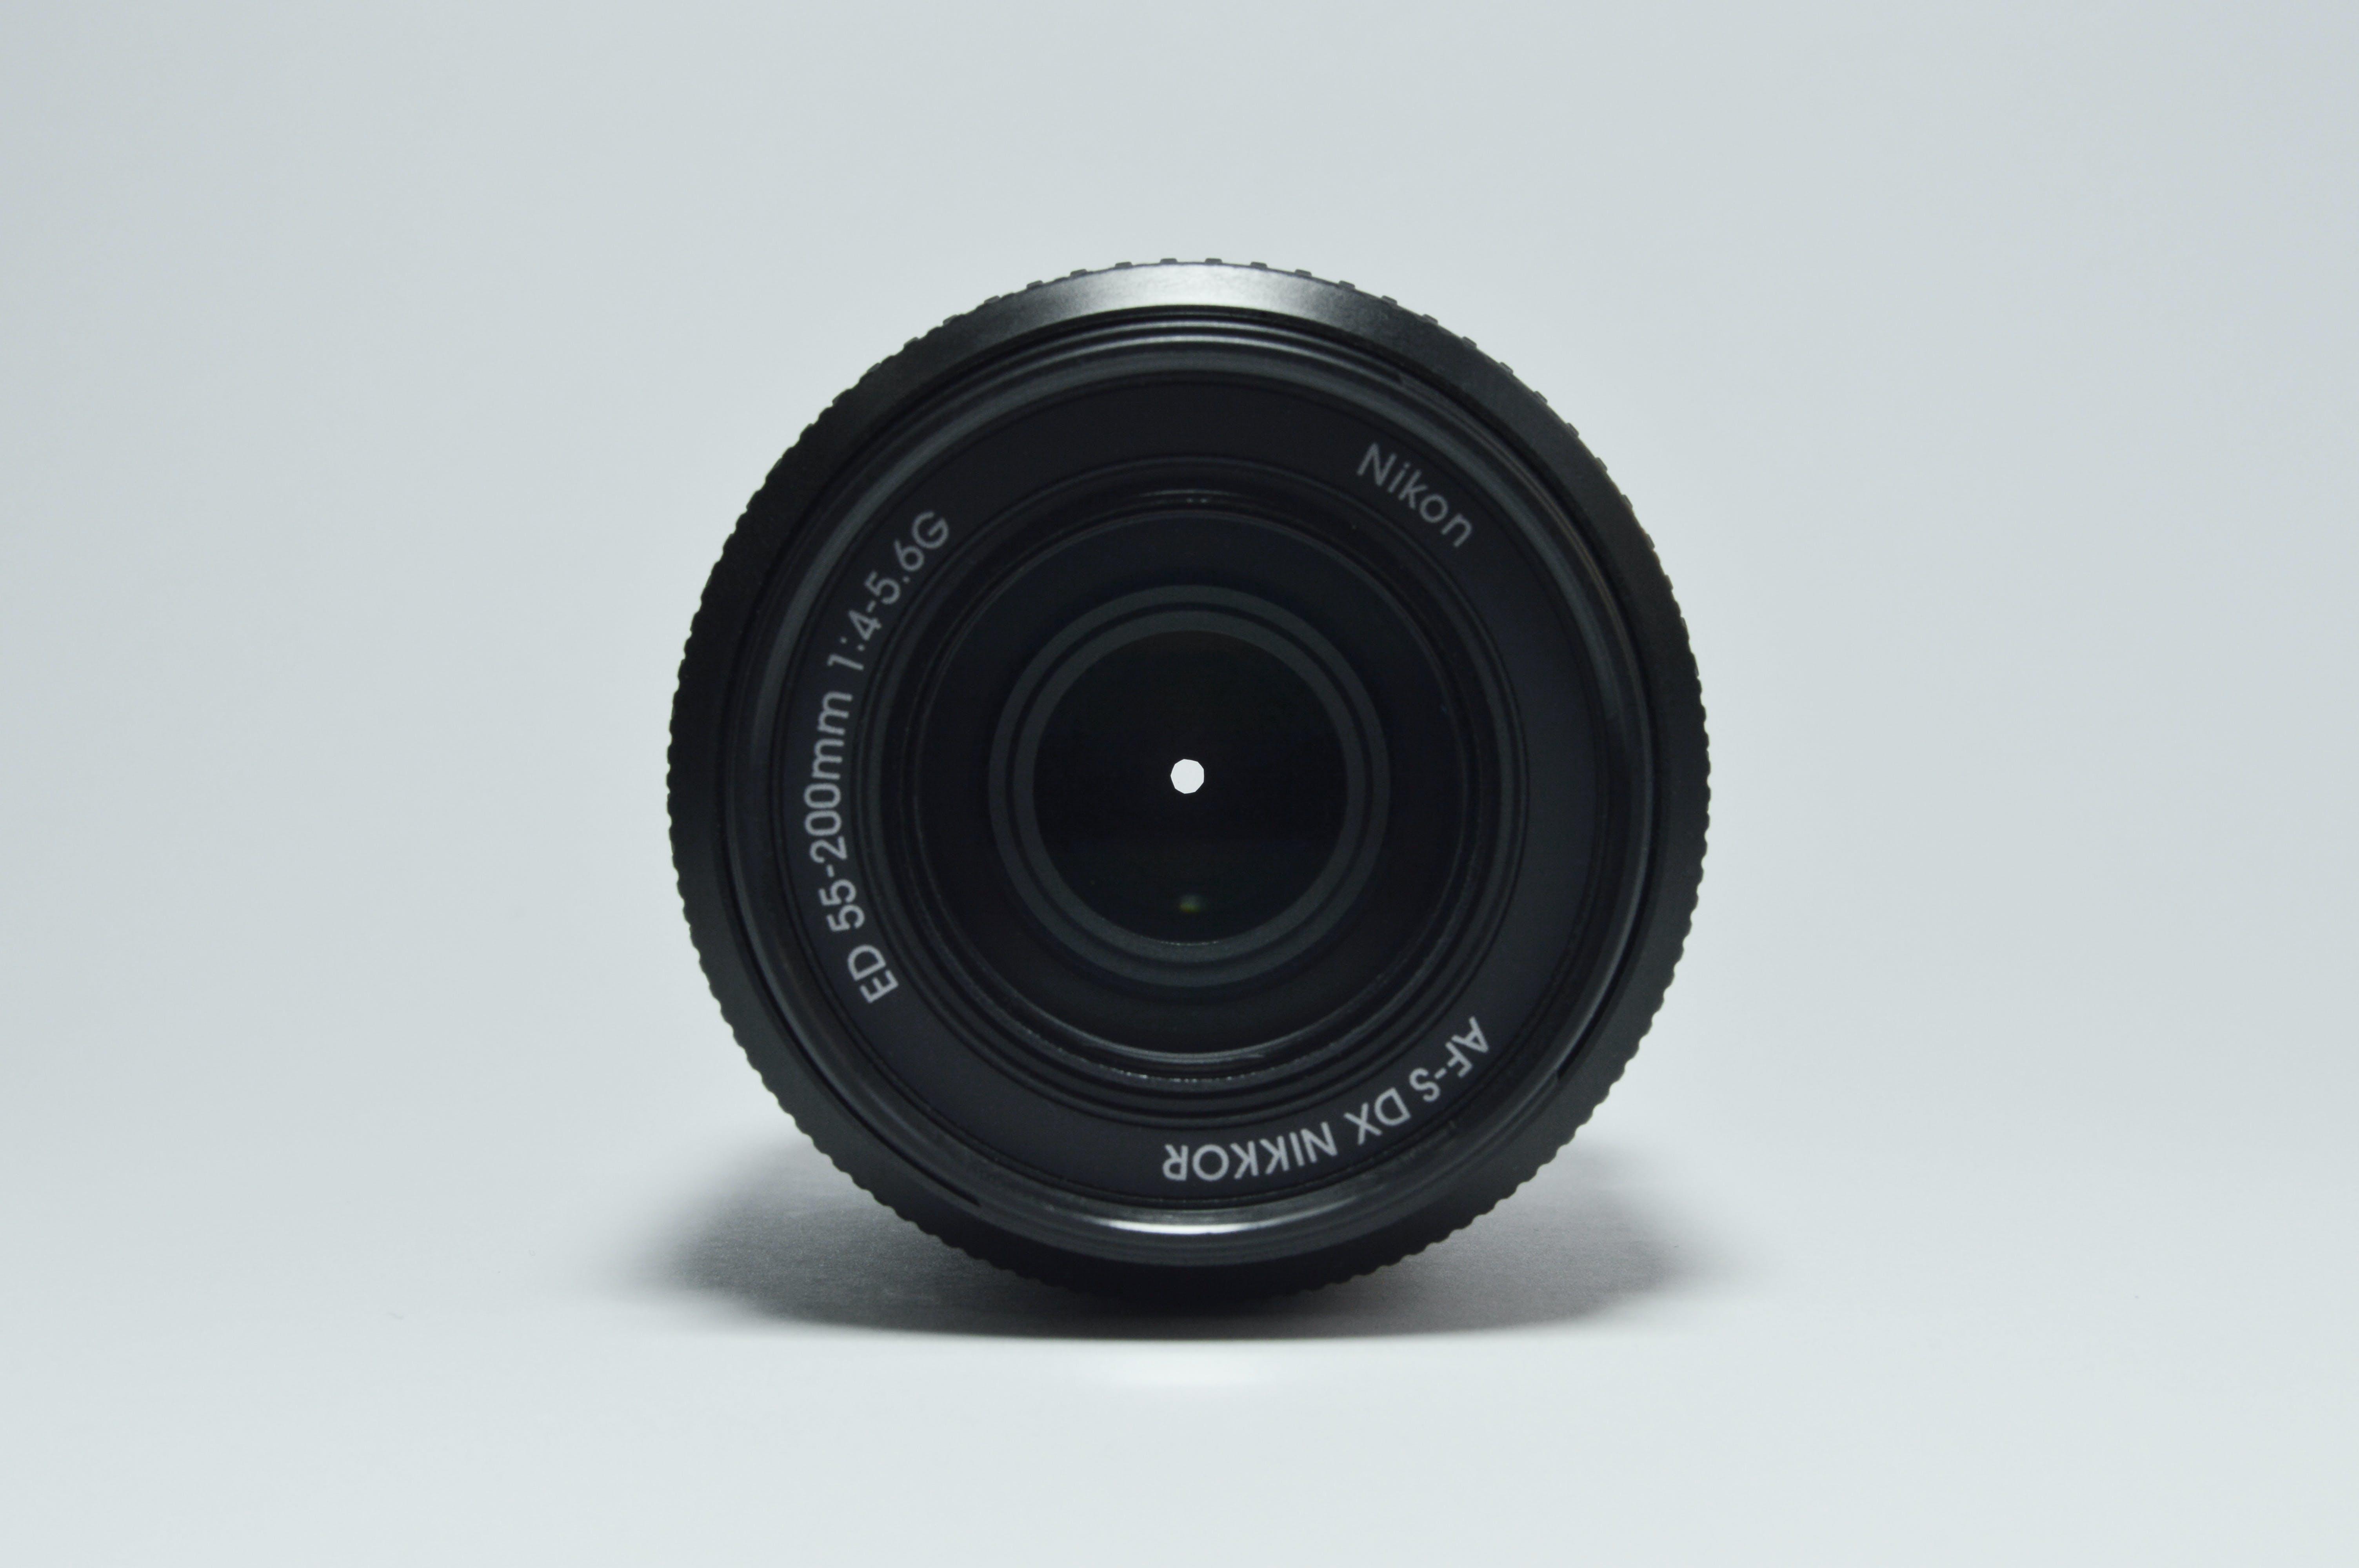 Gratis stockfoto met camera, cameralens, doel, fotografie